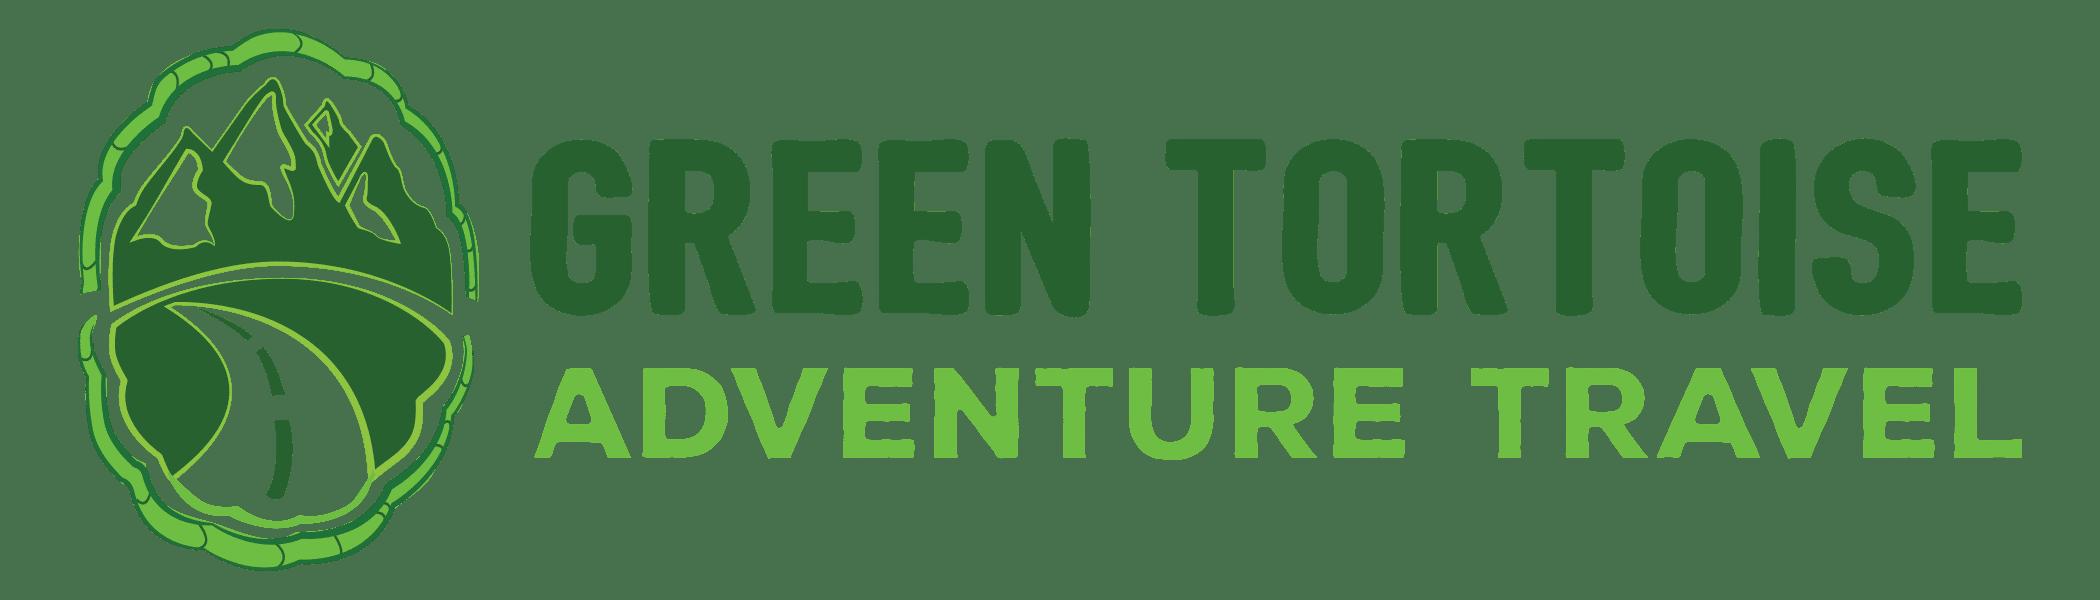 Green Tortoise Adventure Travel